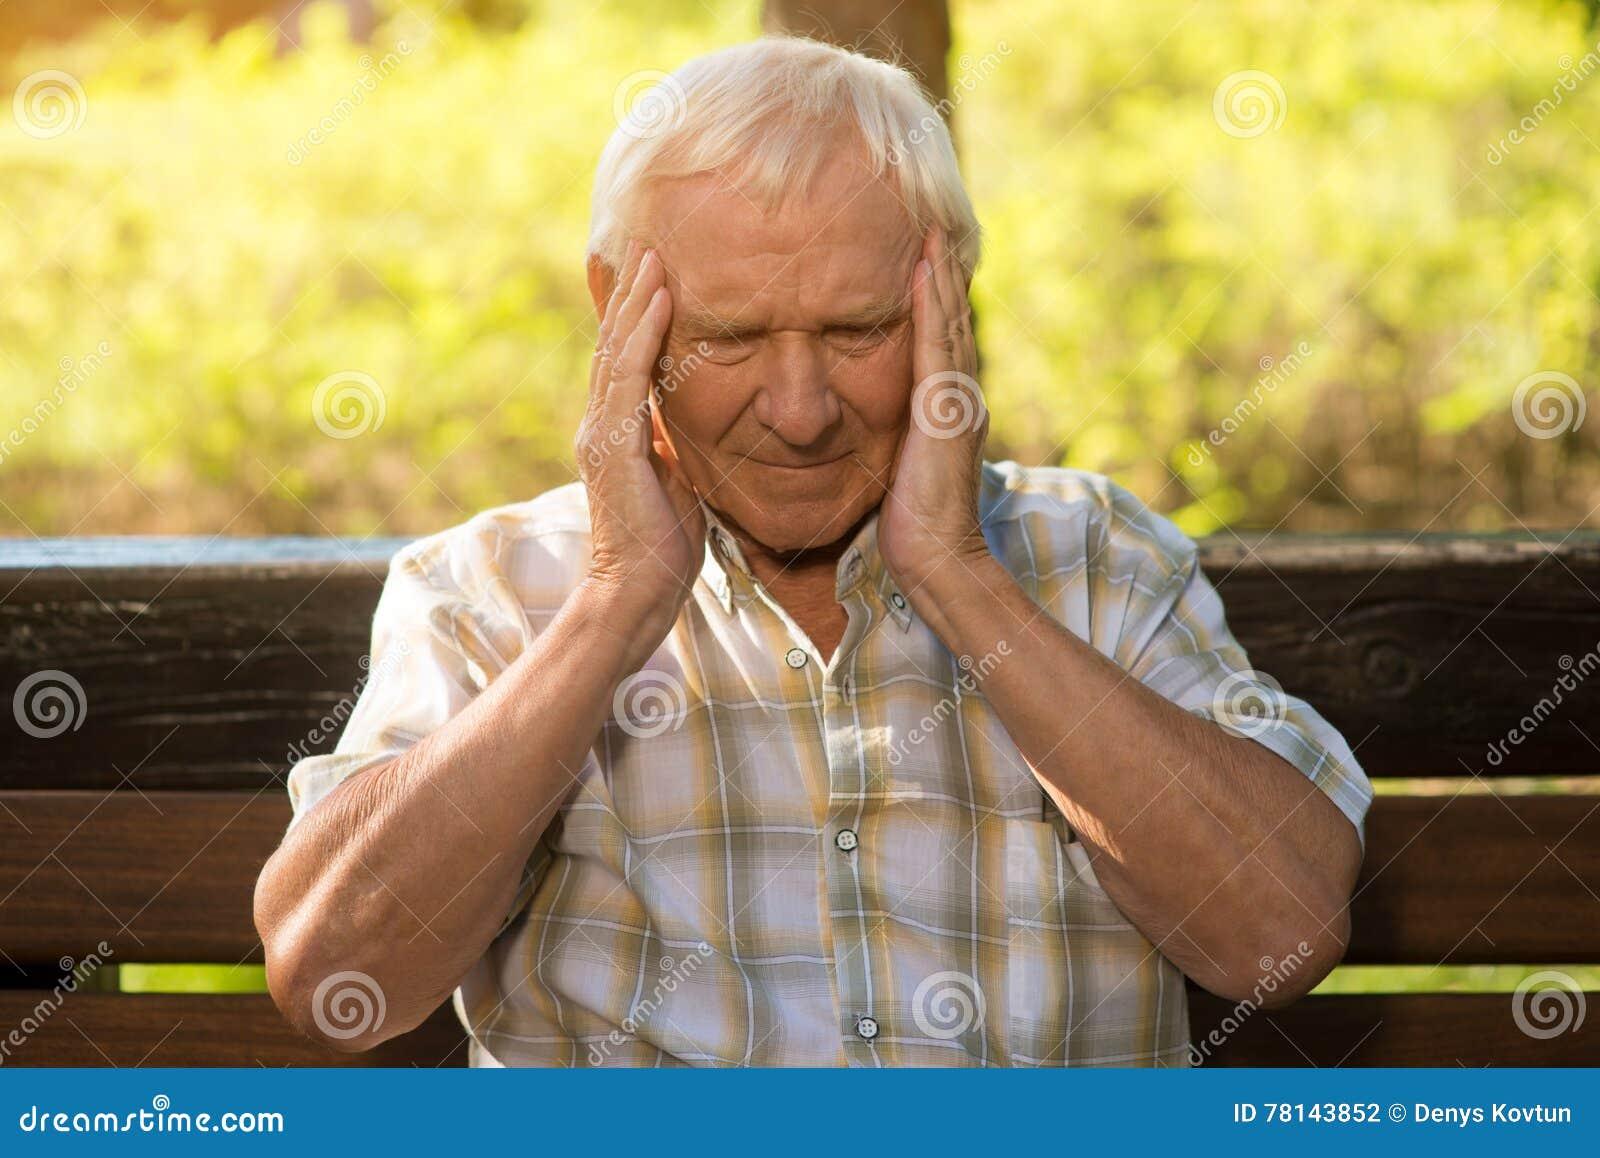 Old man getting head something is